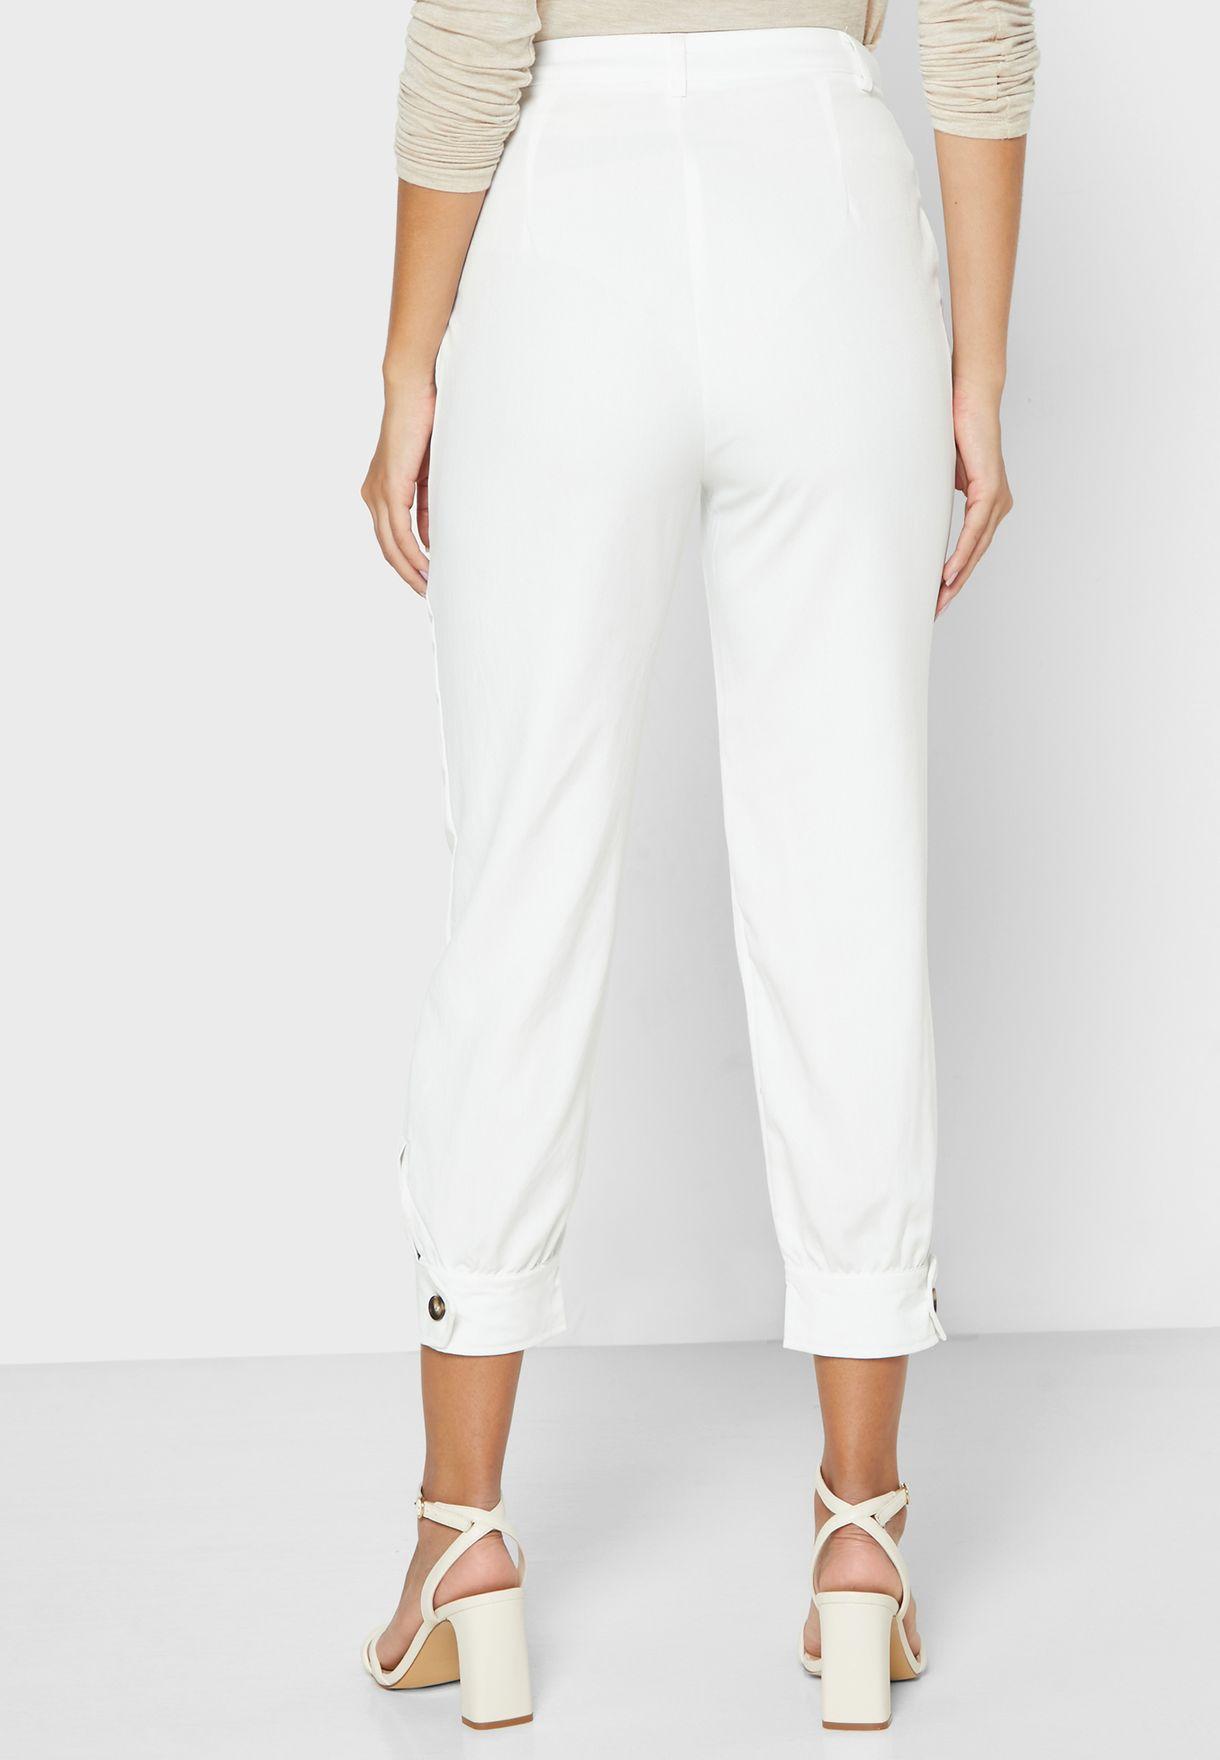 Tailored Cuffed Pants